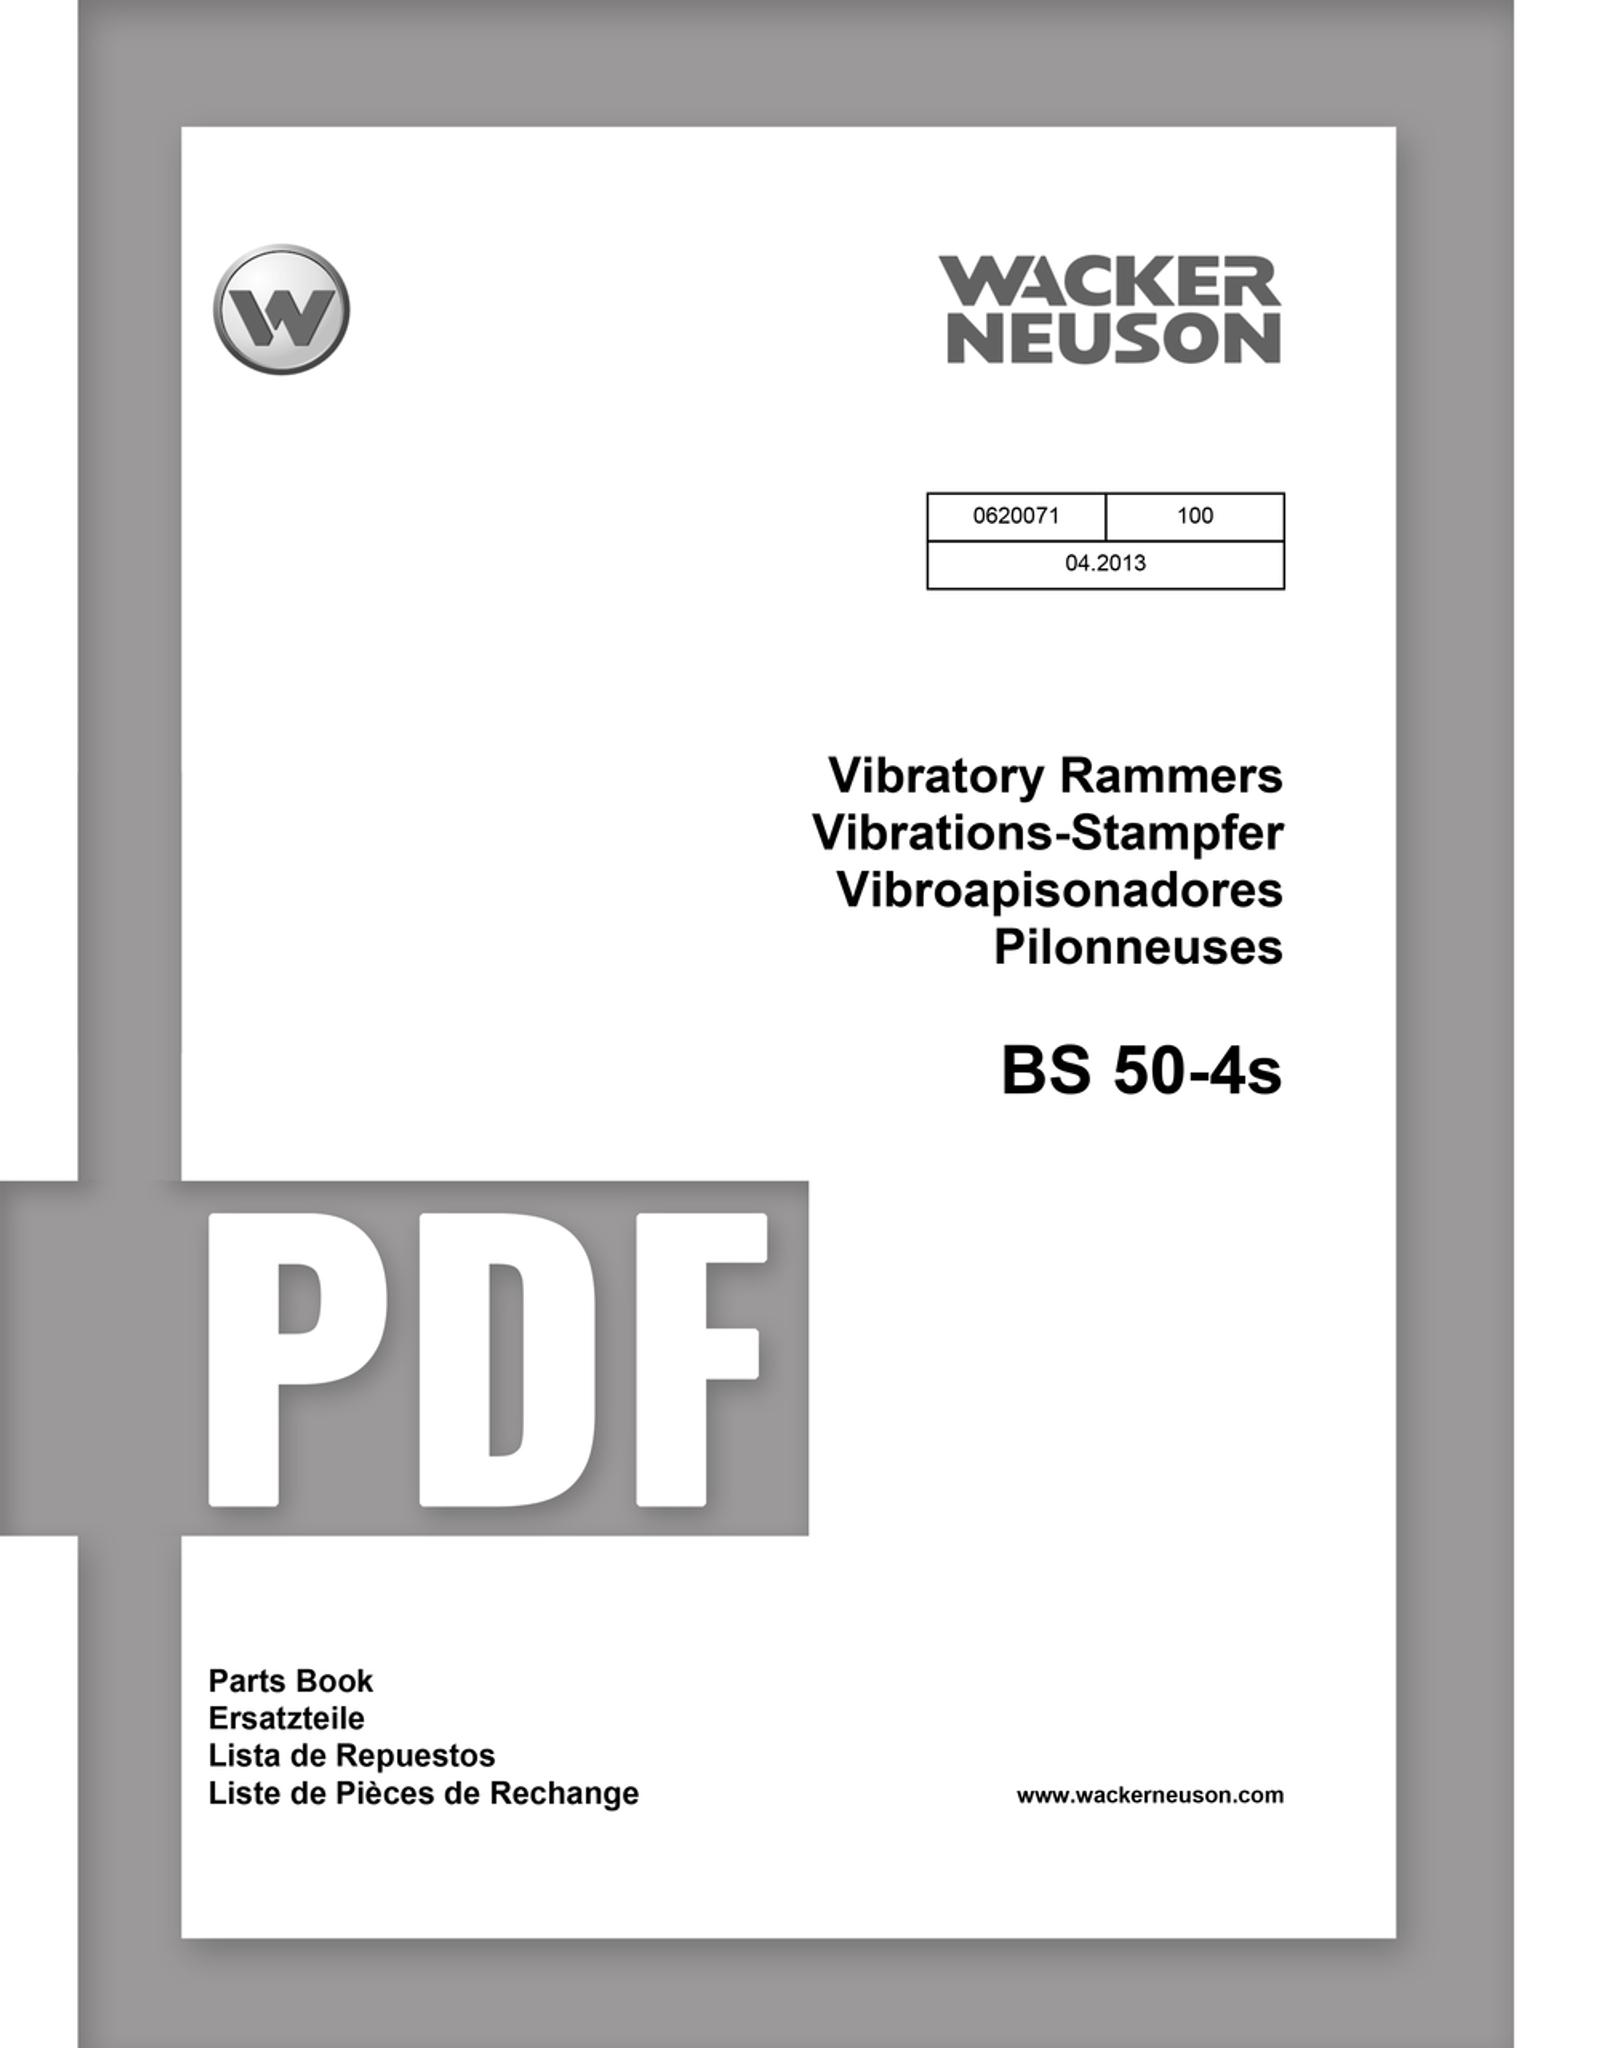 Parts Manual | BS50-4S - Item: 0620071, REV100 | Free Download